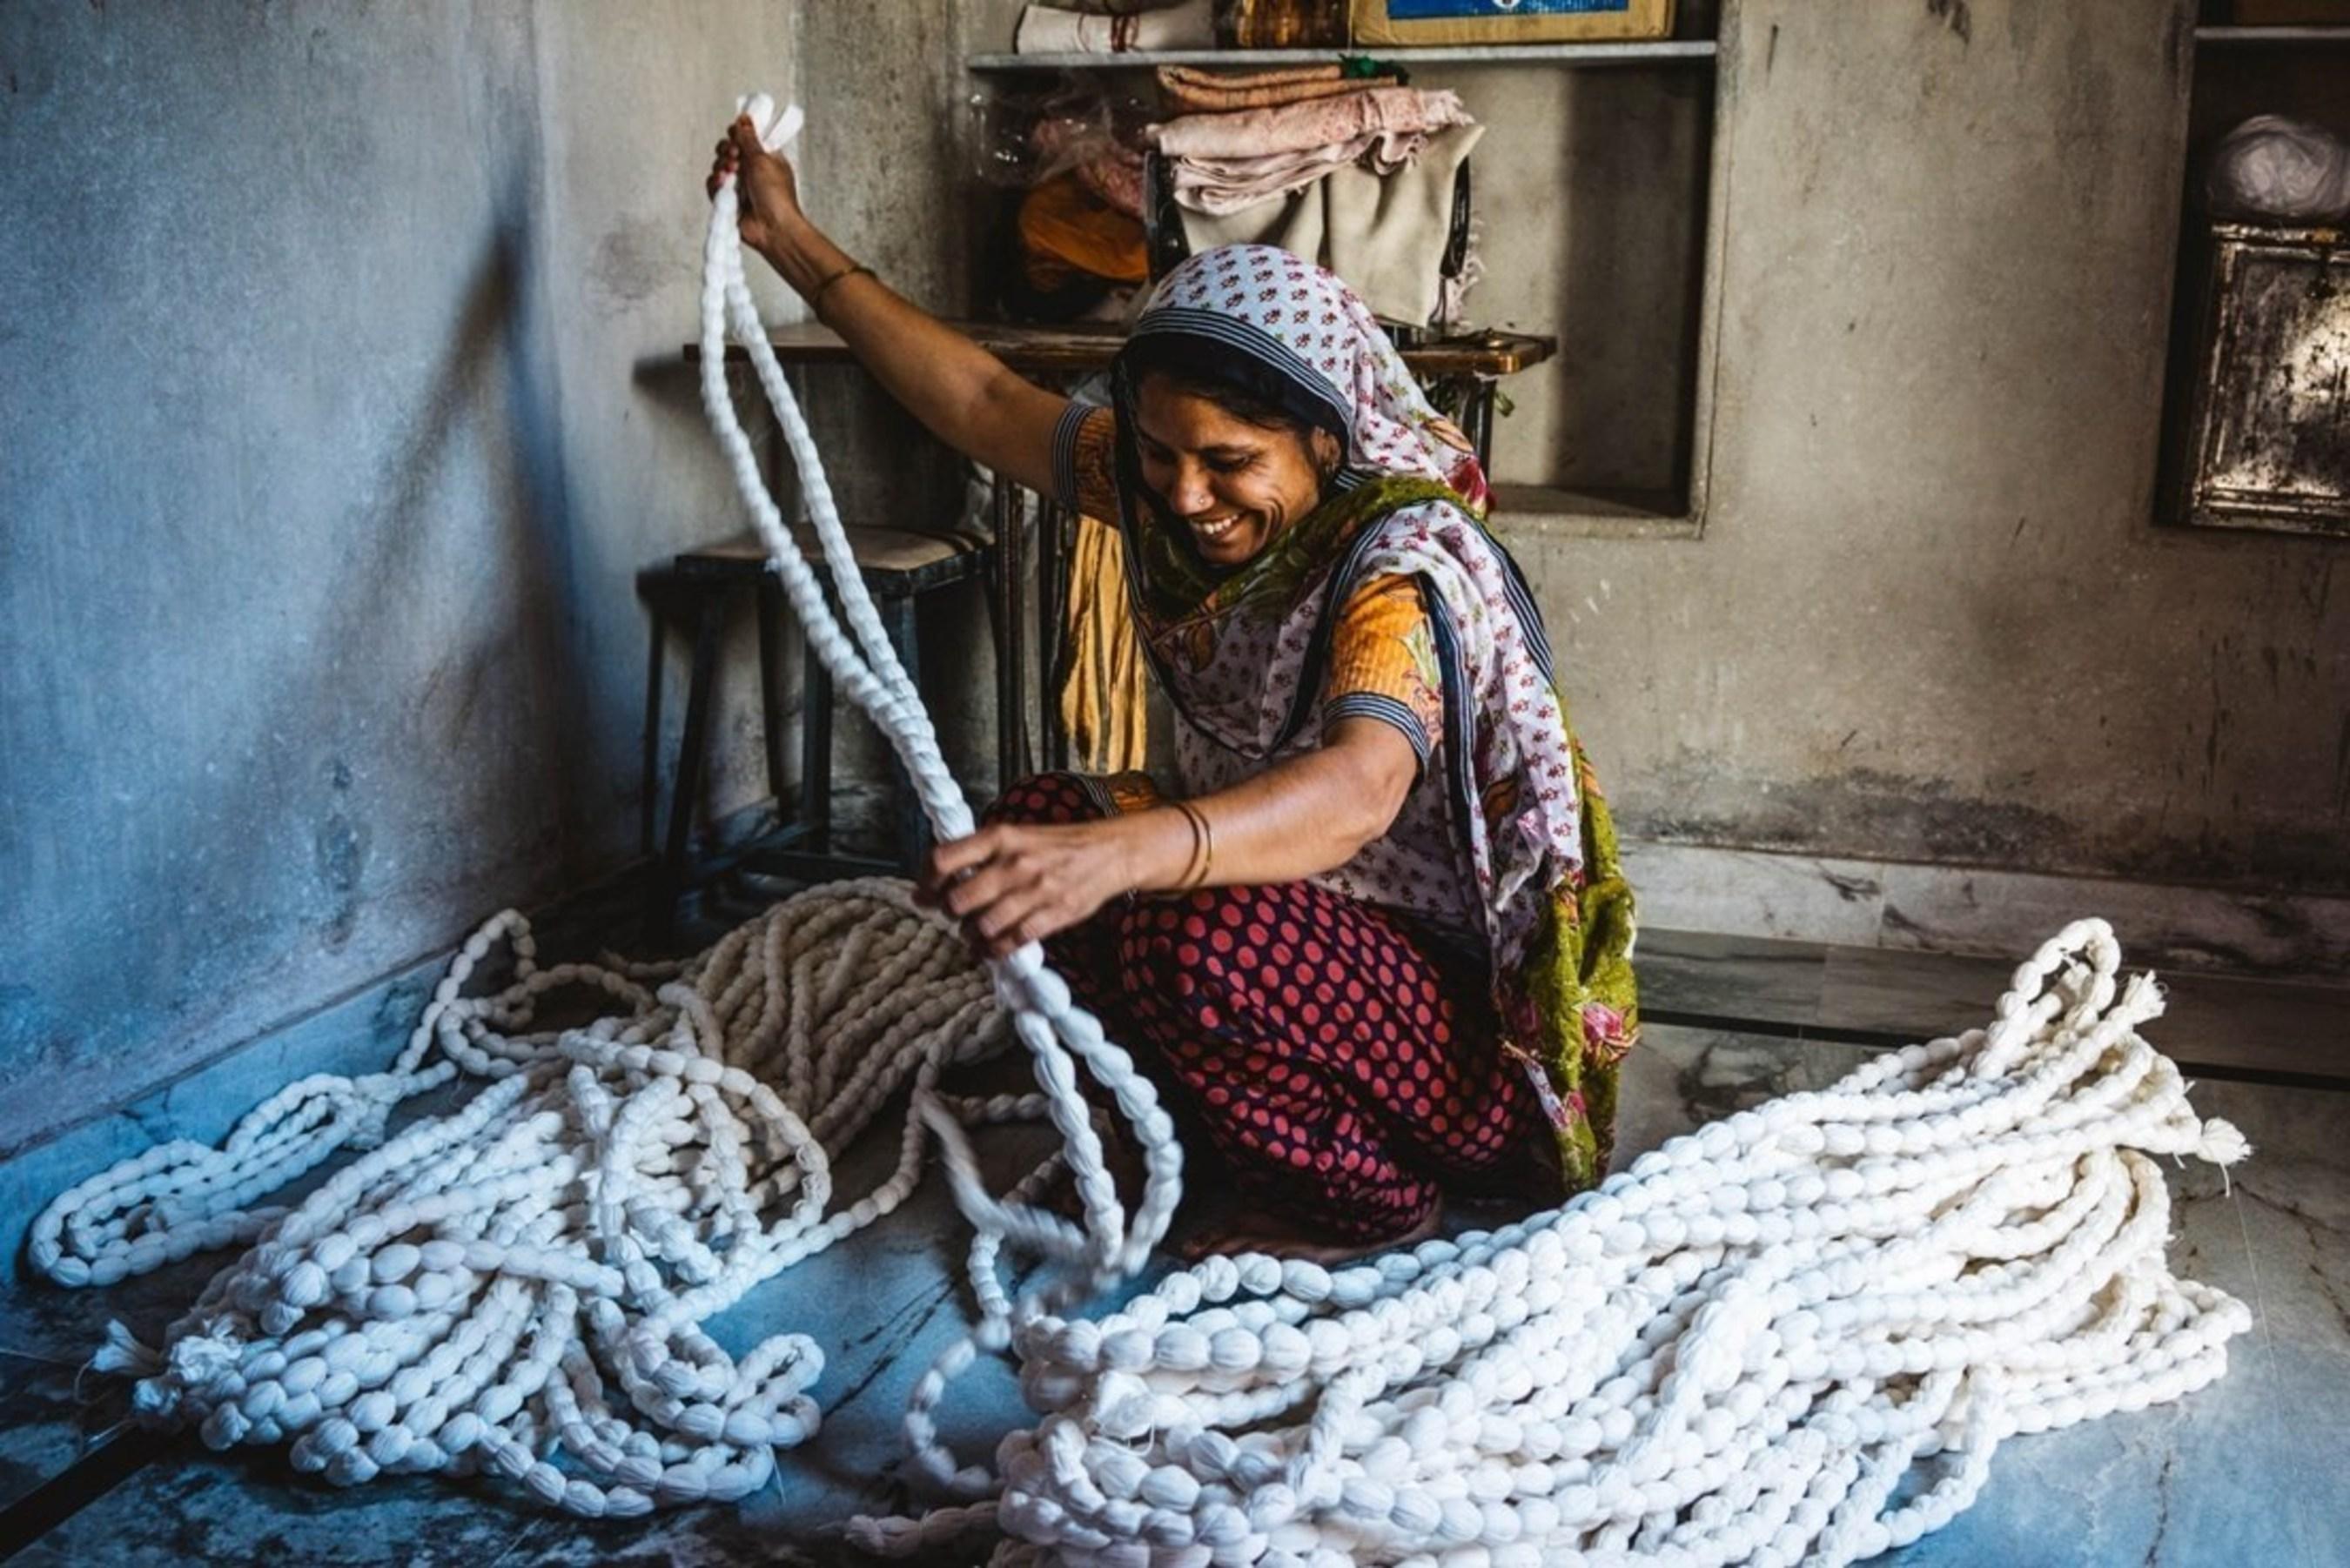 A woman tie-dies fabric in Jodhpur, India.